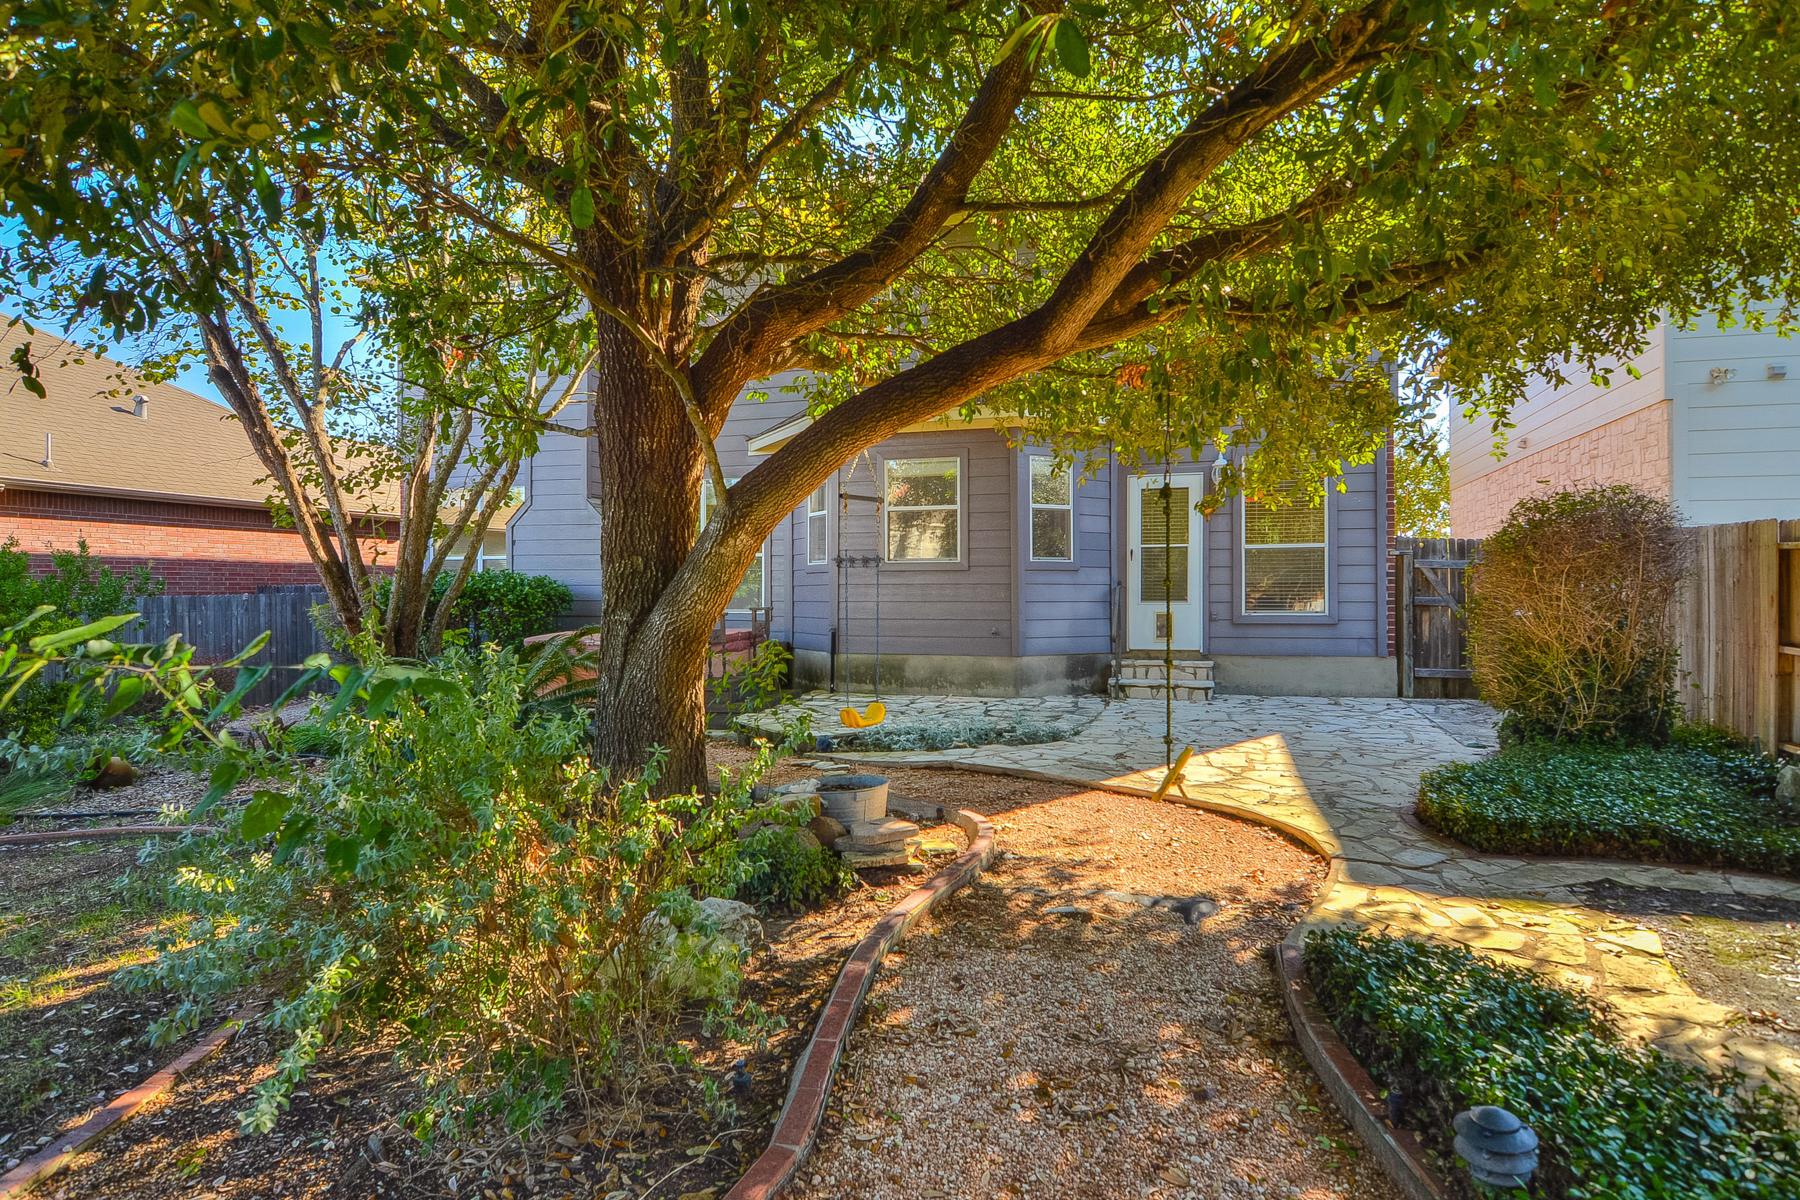 Additional photo for property listing at Great Rental in Crescent Oaks 24807 Crescent Run San Antonio, Texas 78258 Estados Unidos